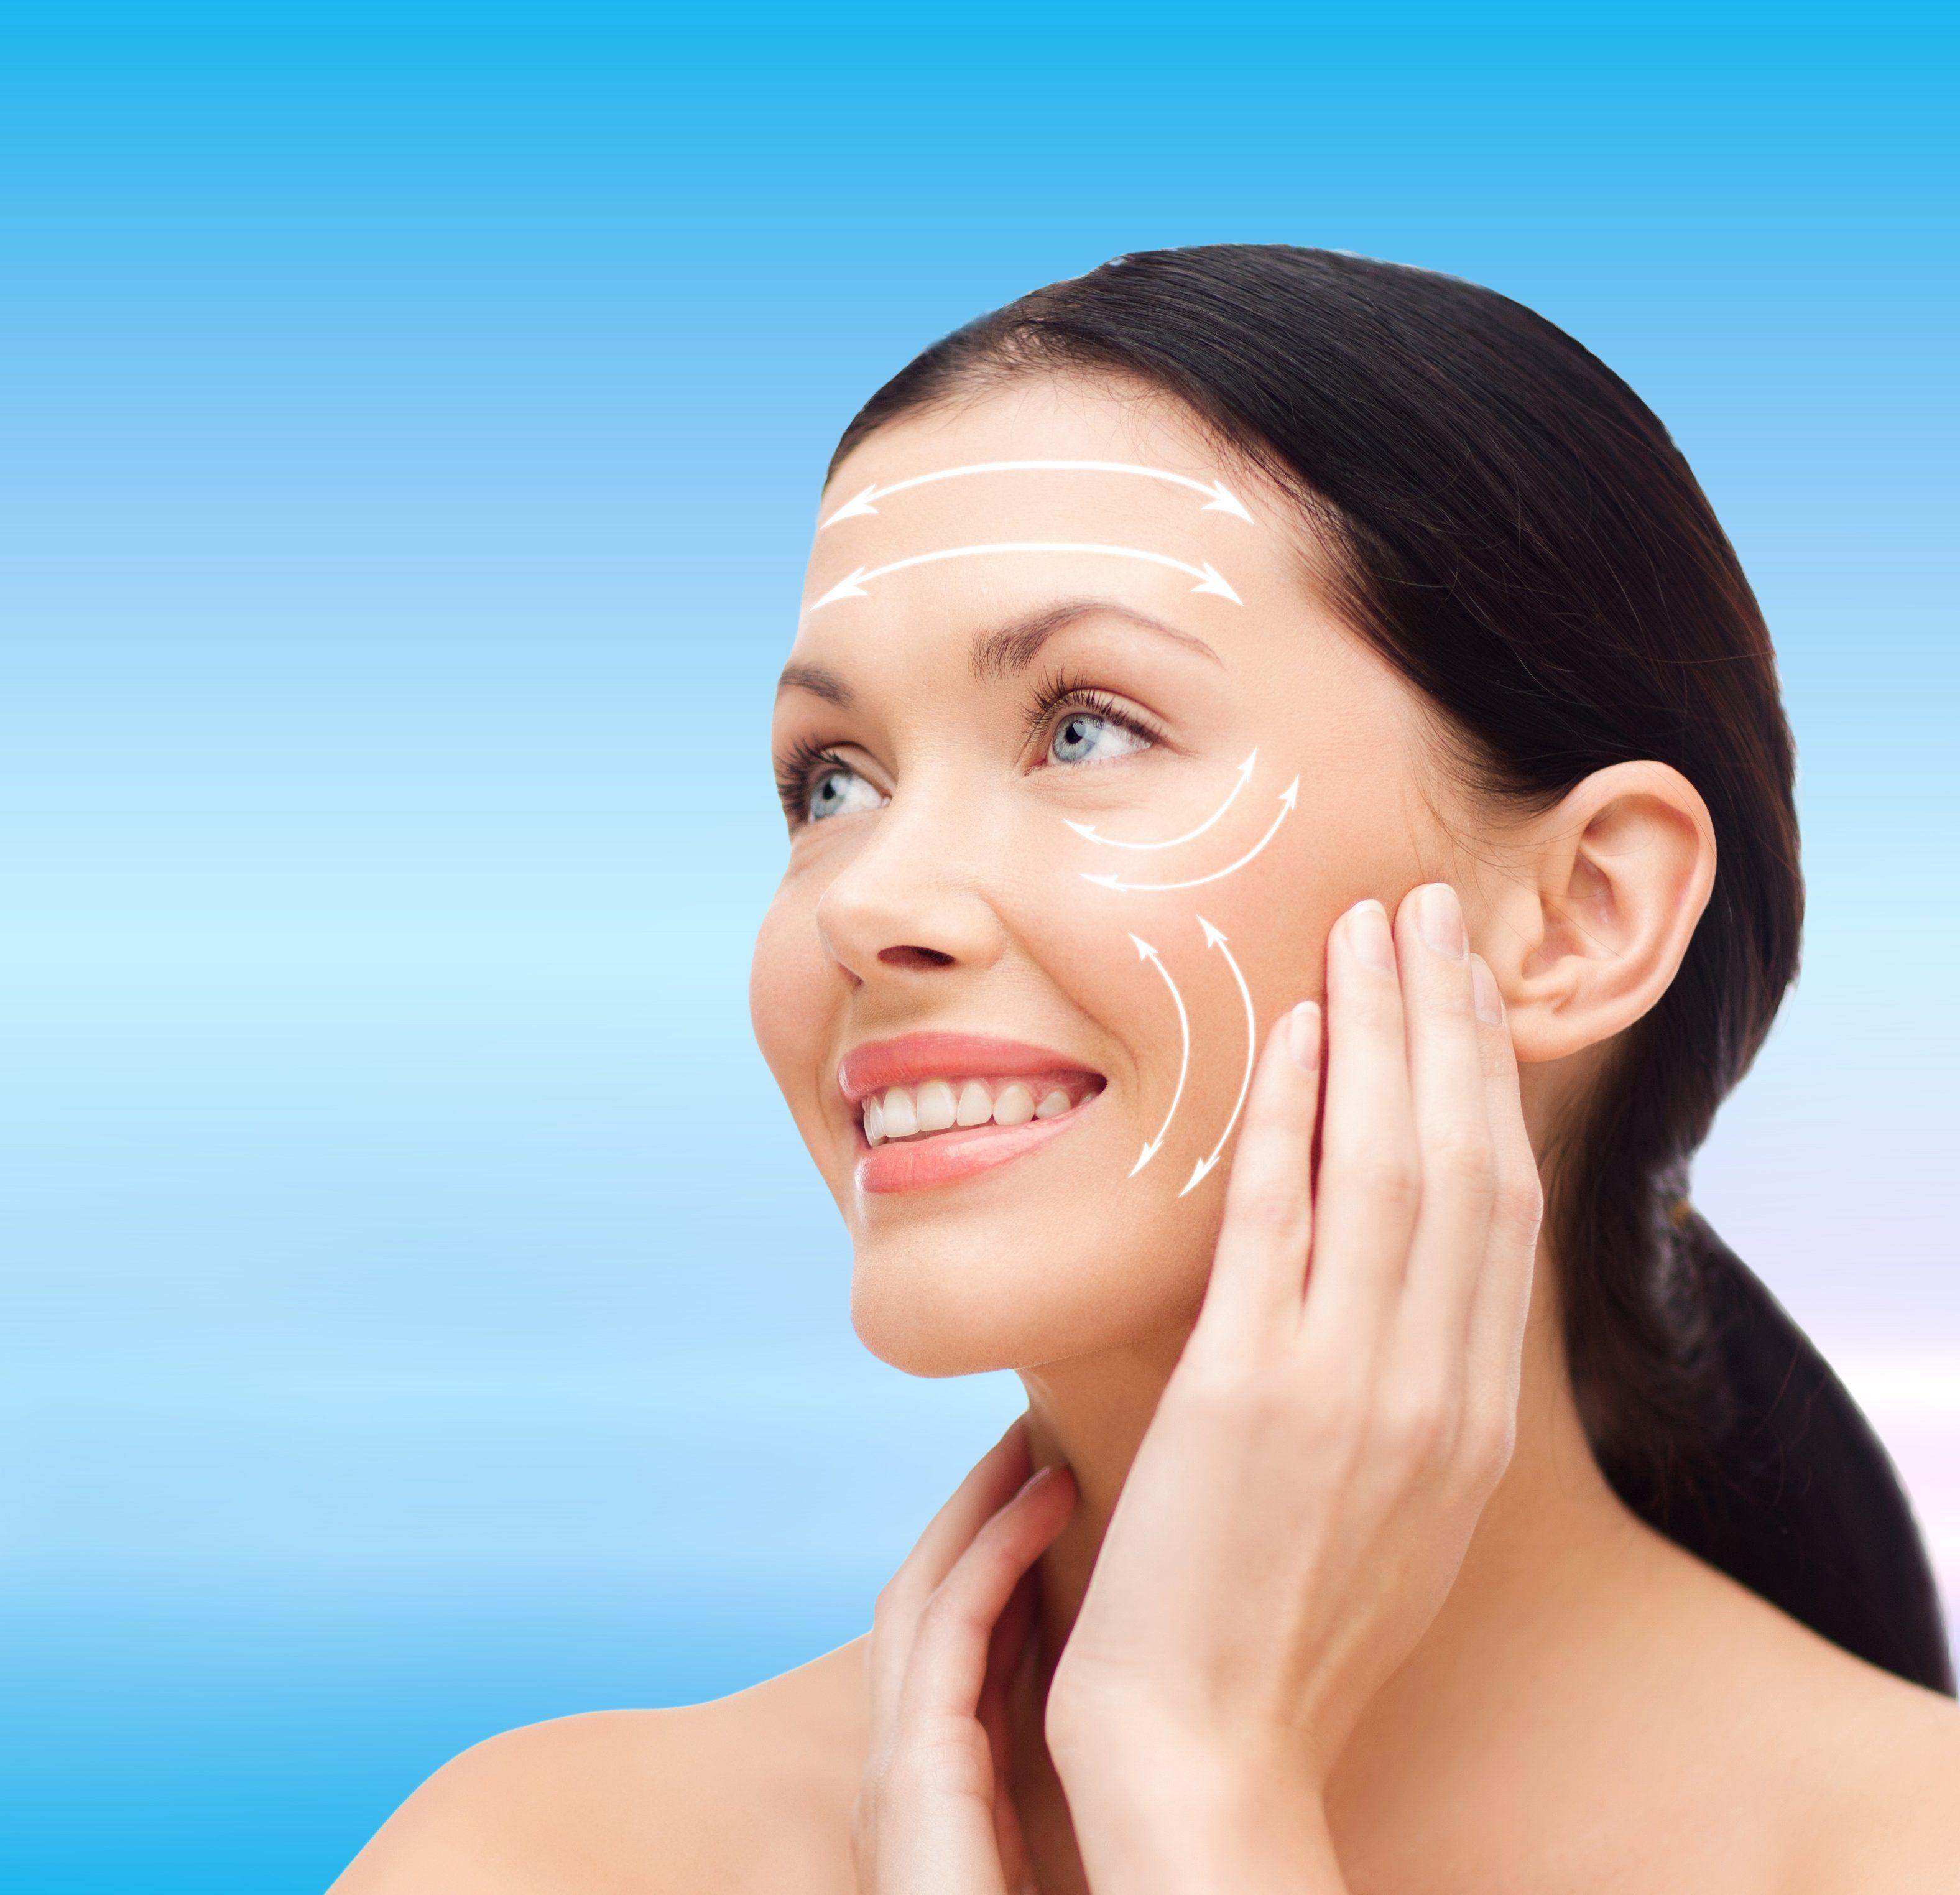 Remodelación facial 3D: Tratamientos de Centro de Medicina Estética  Mery Vázquez